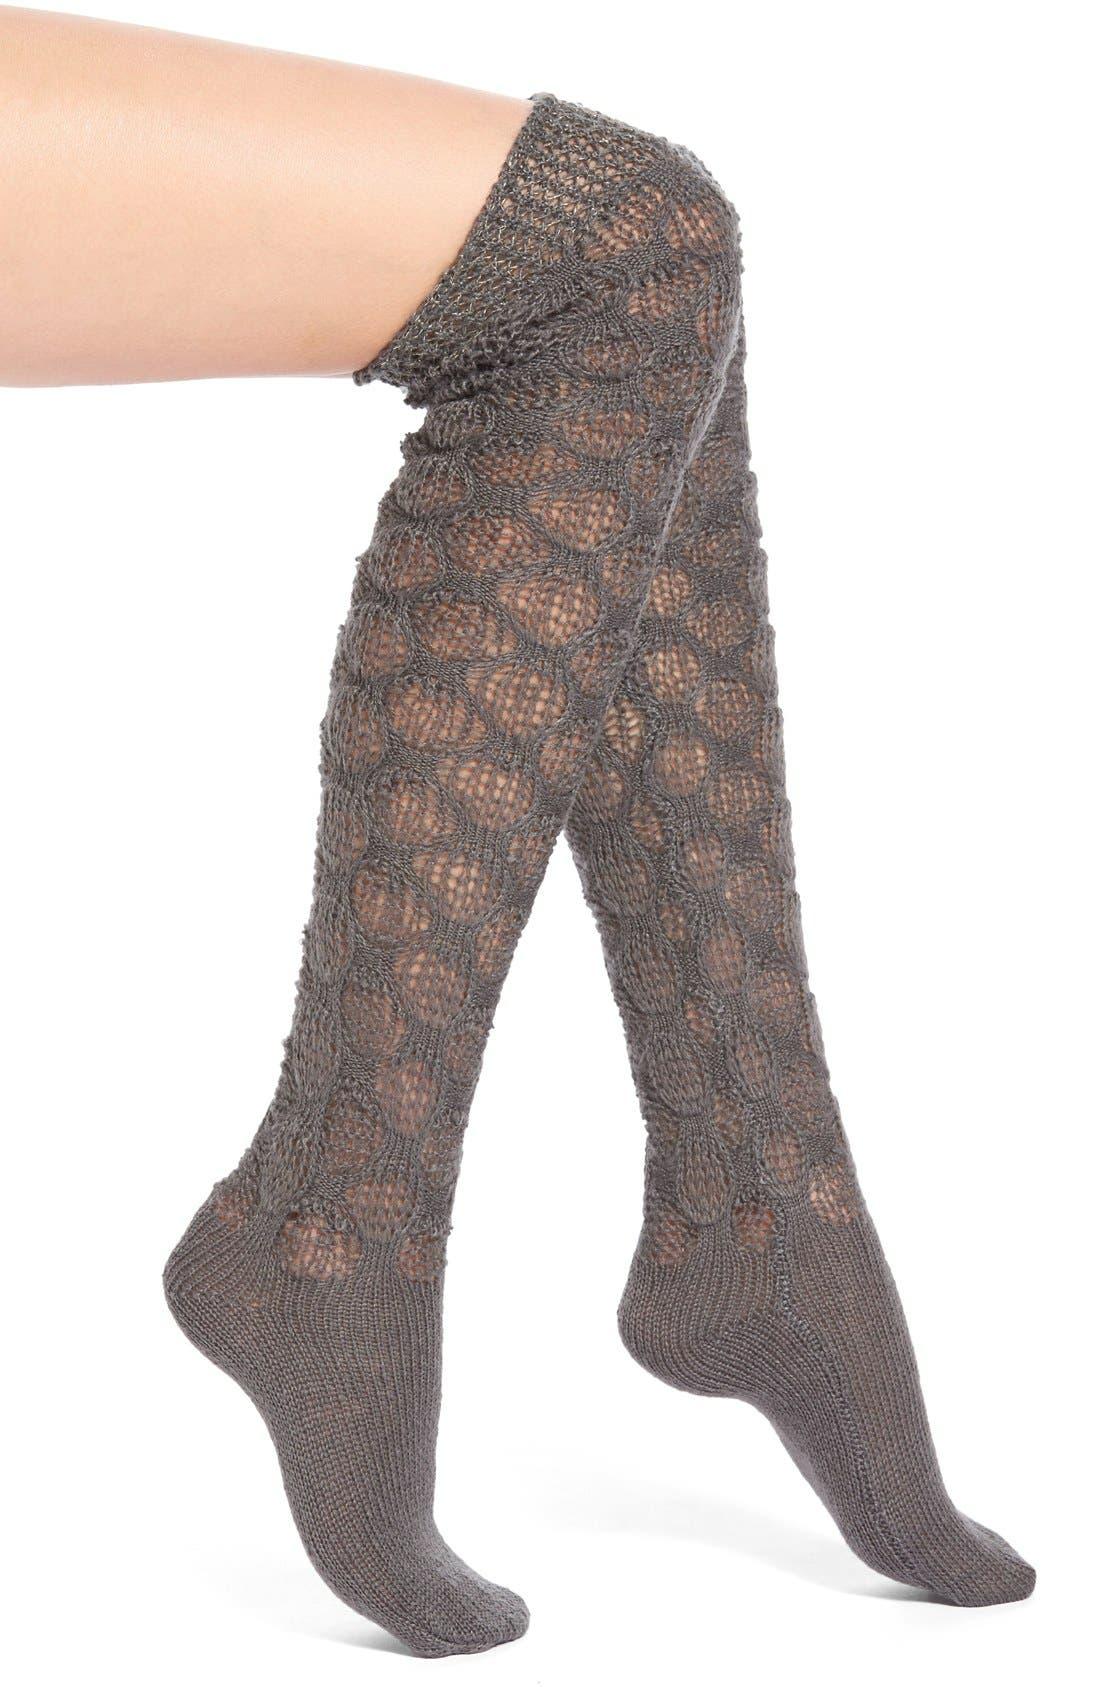 'Frosted' Crochet Over the Knee Socks,                             Main thumbnail 1, color,                             Peppercorn